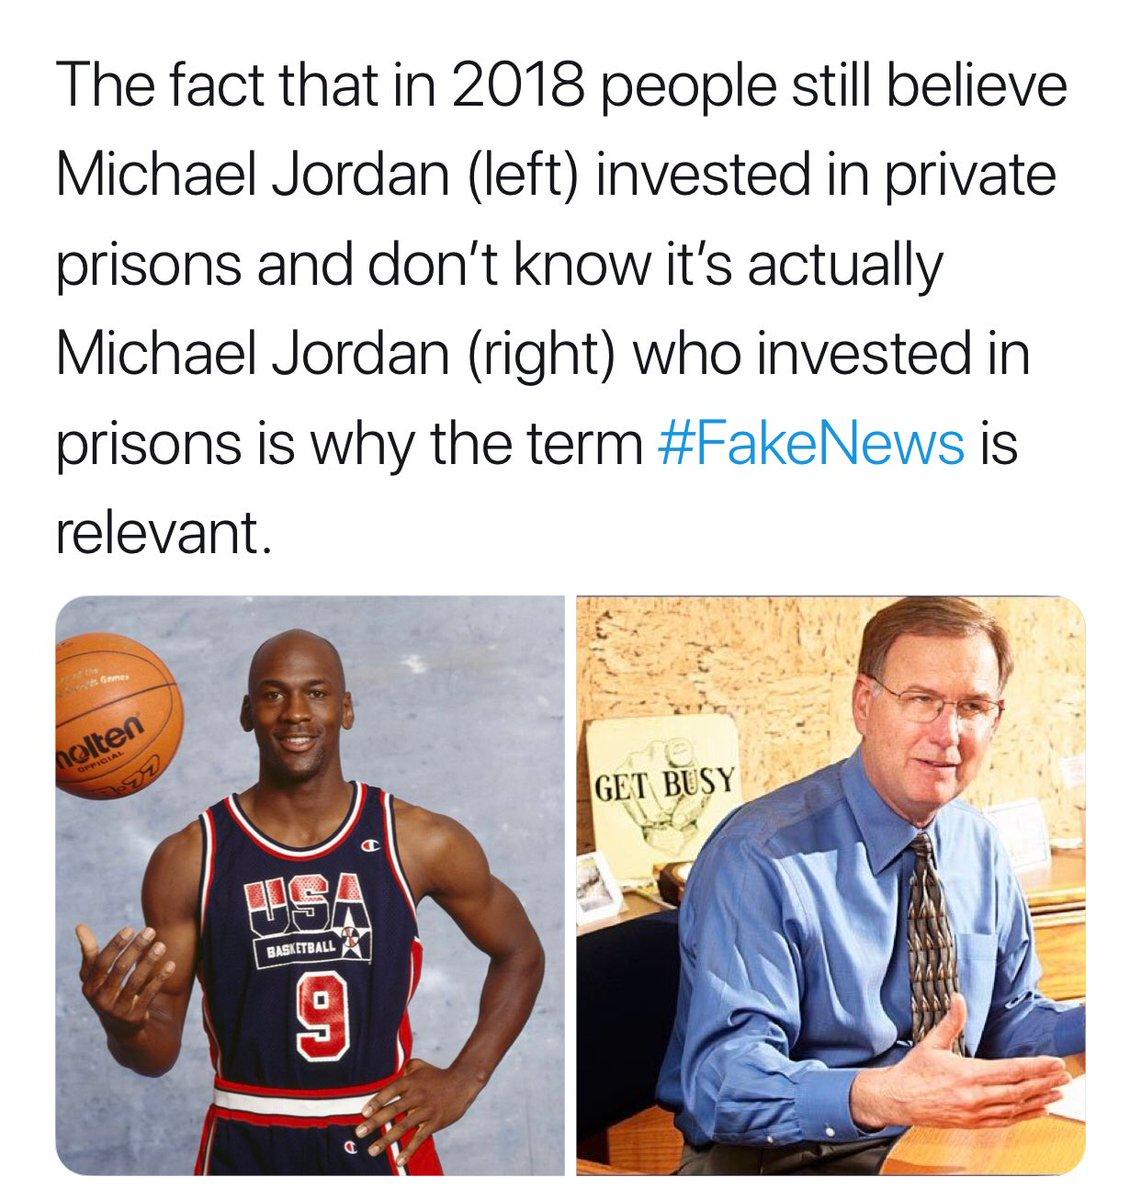 Michael jordan owns prisons